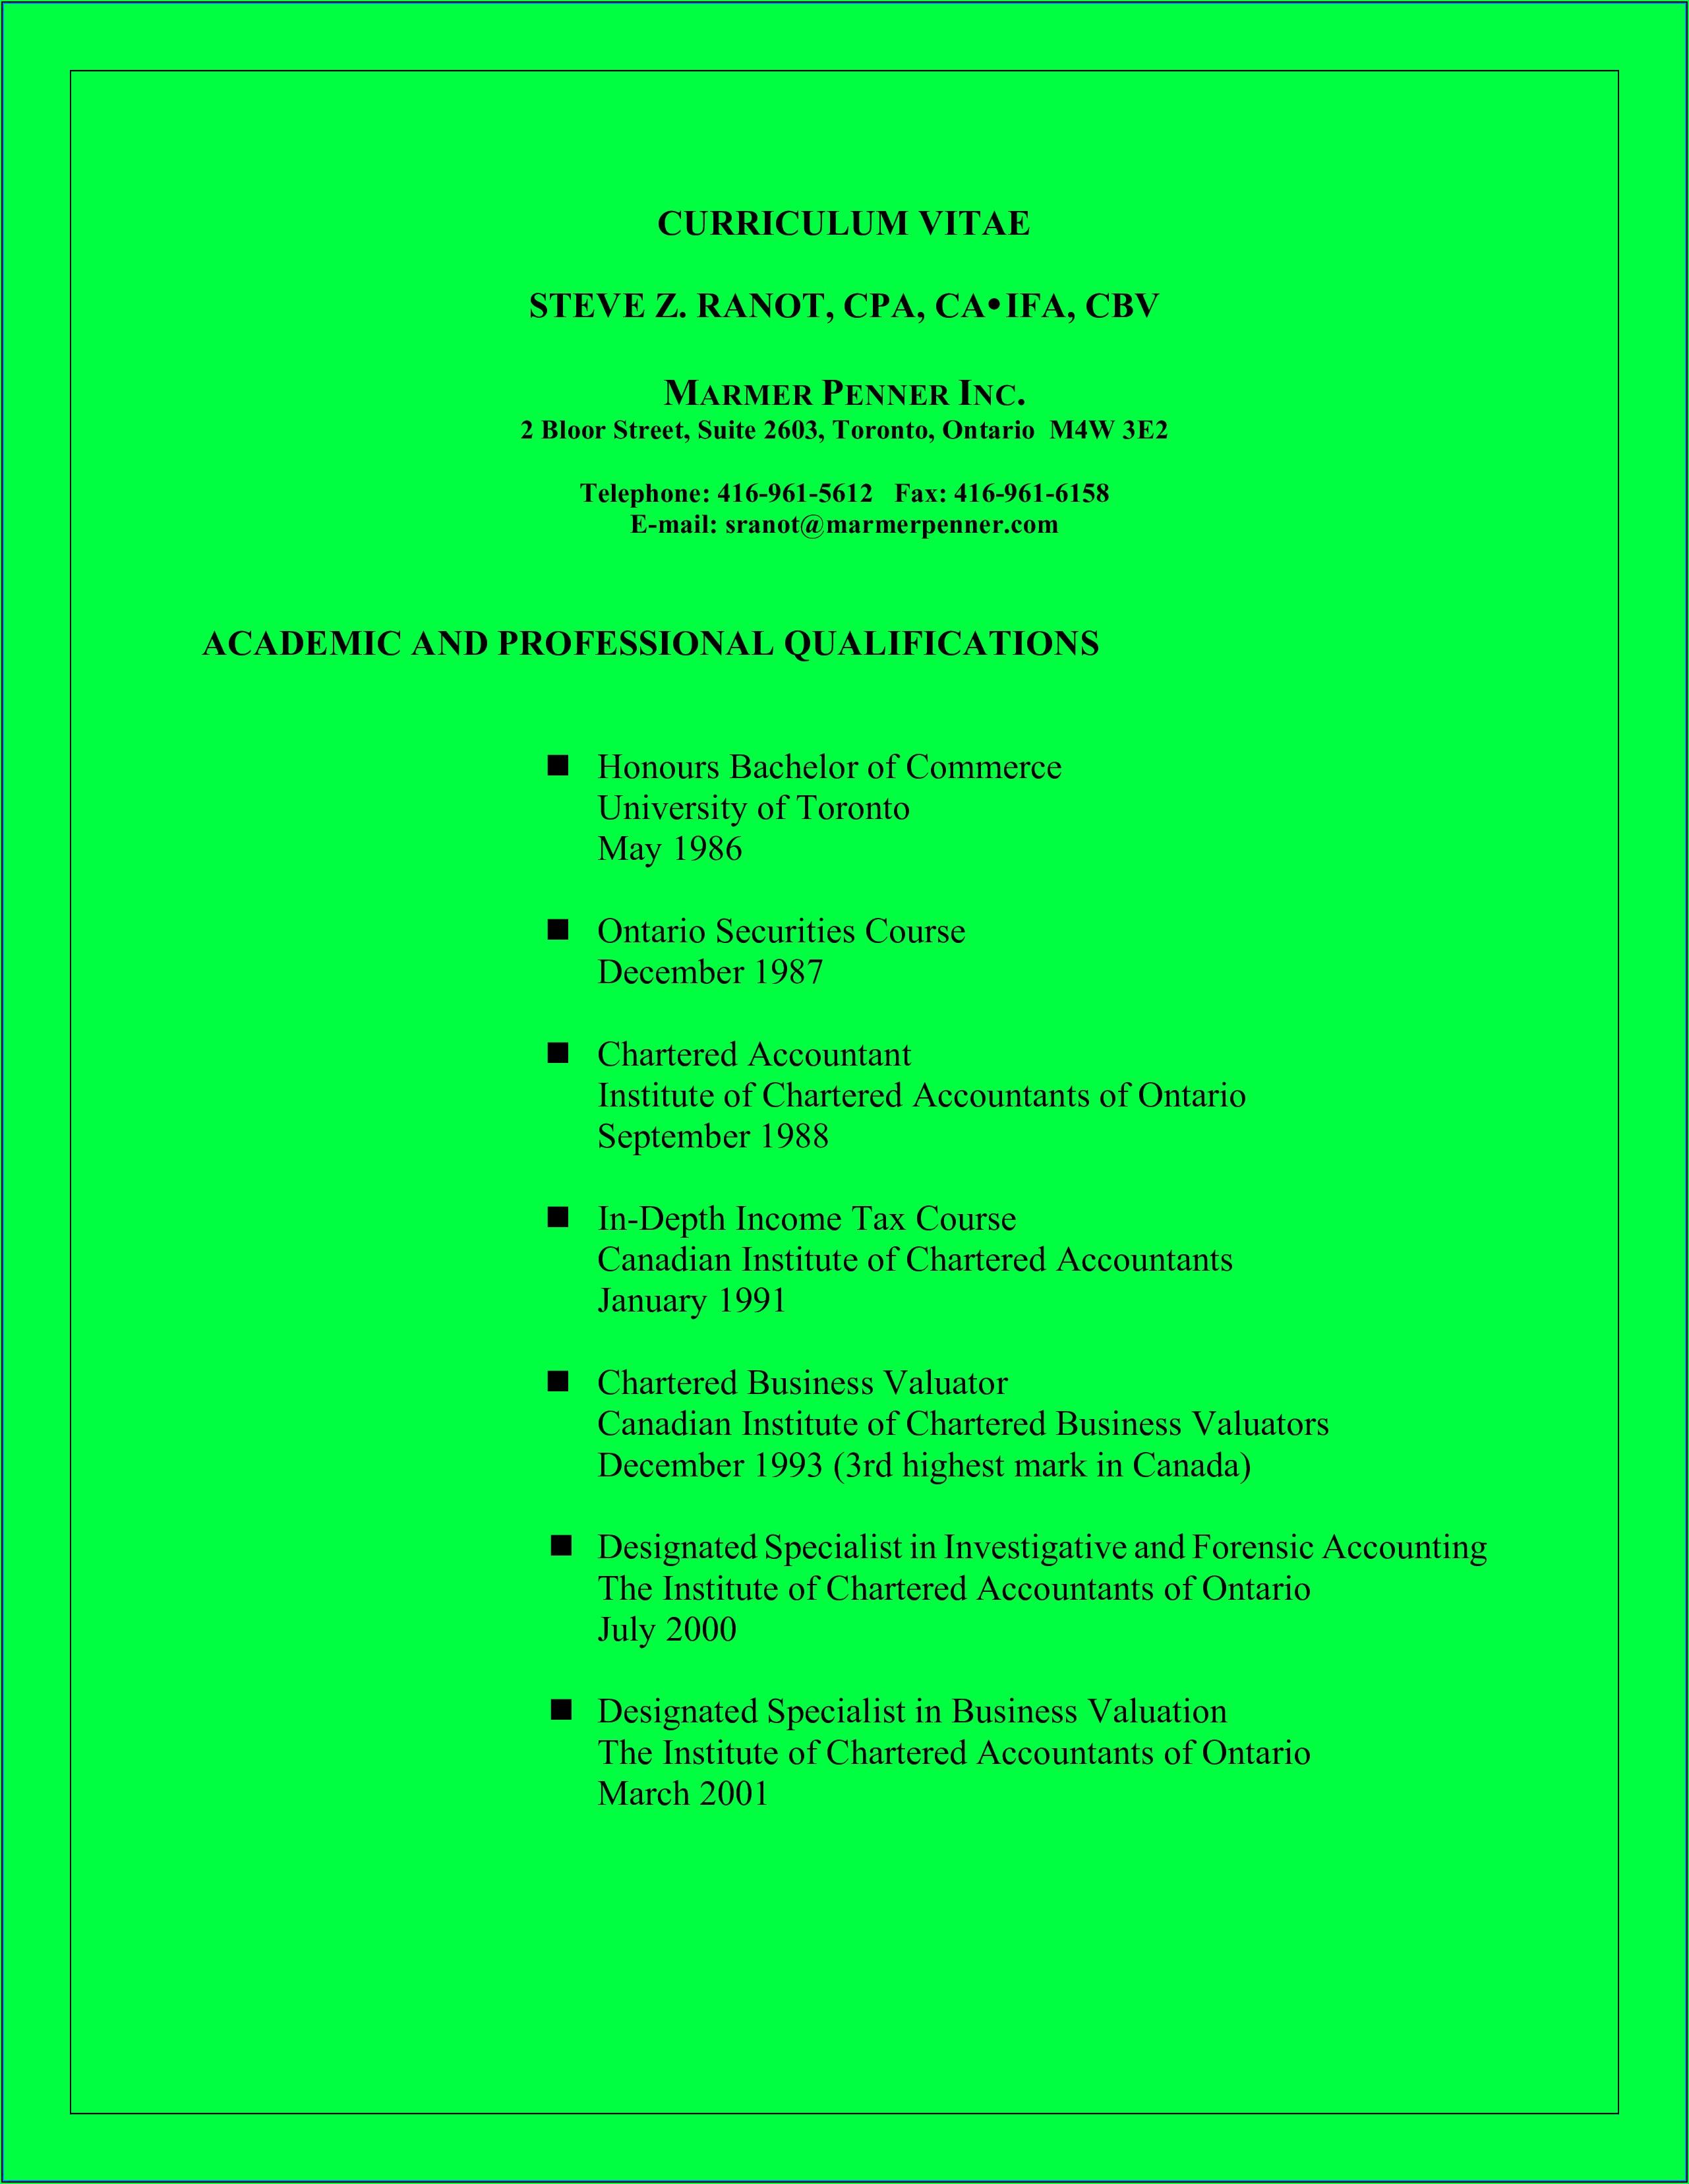 Curriculum Vitae Samples For Accountants